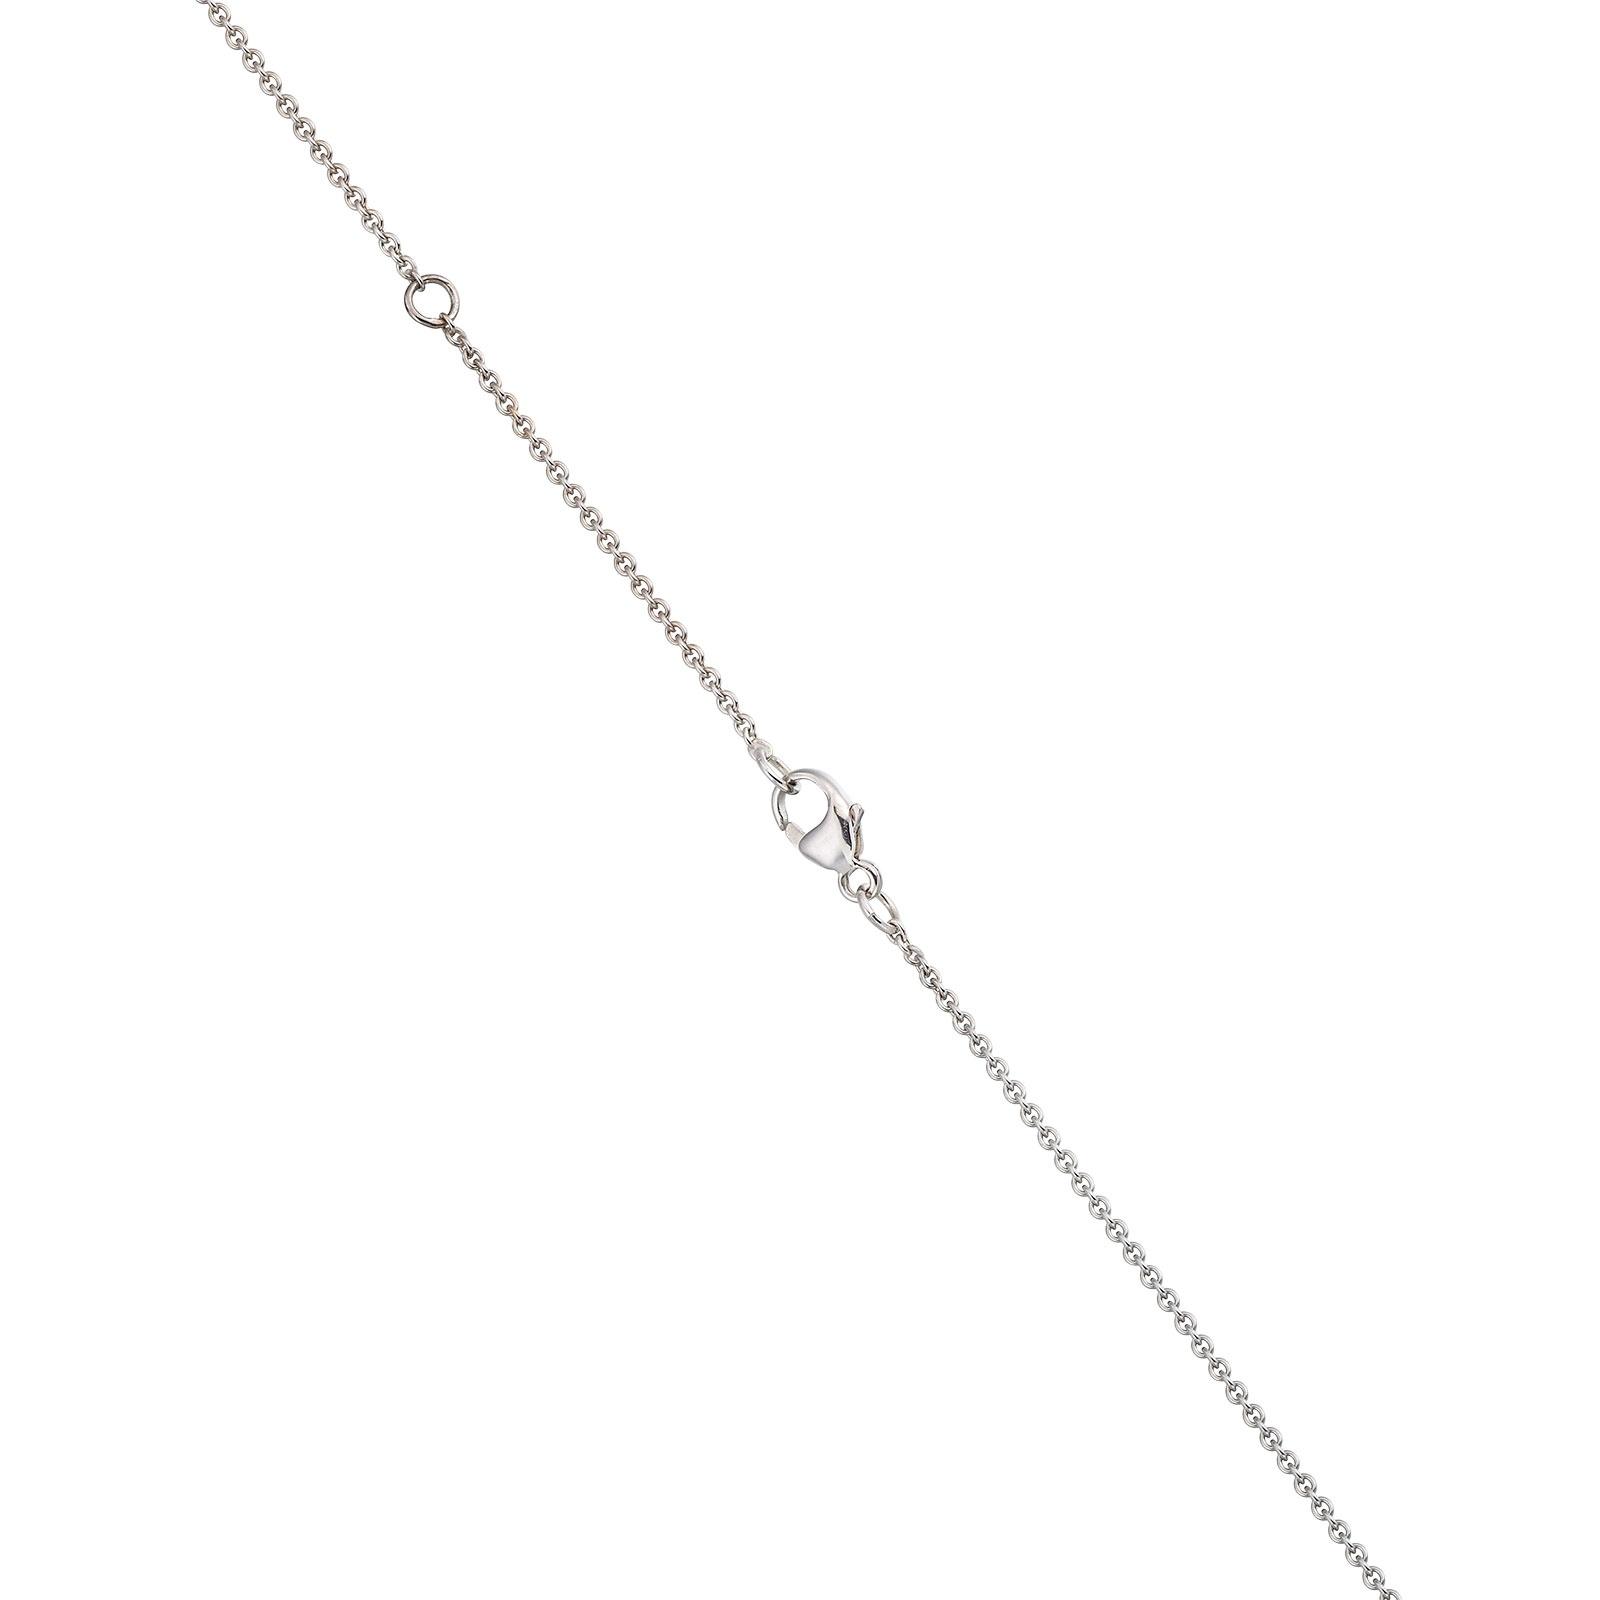 Mythologie Dewdrop Akoya Pearl Pendant in White Gold-APVARWG1232-1